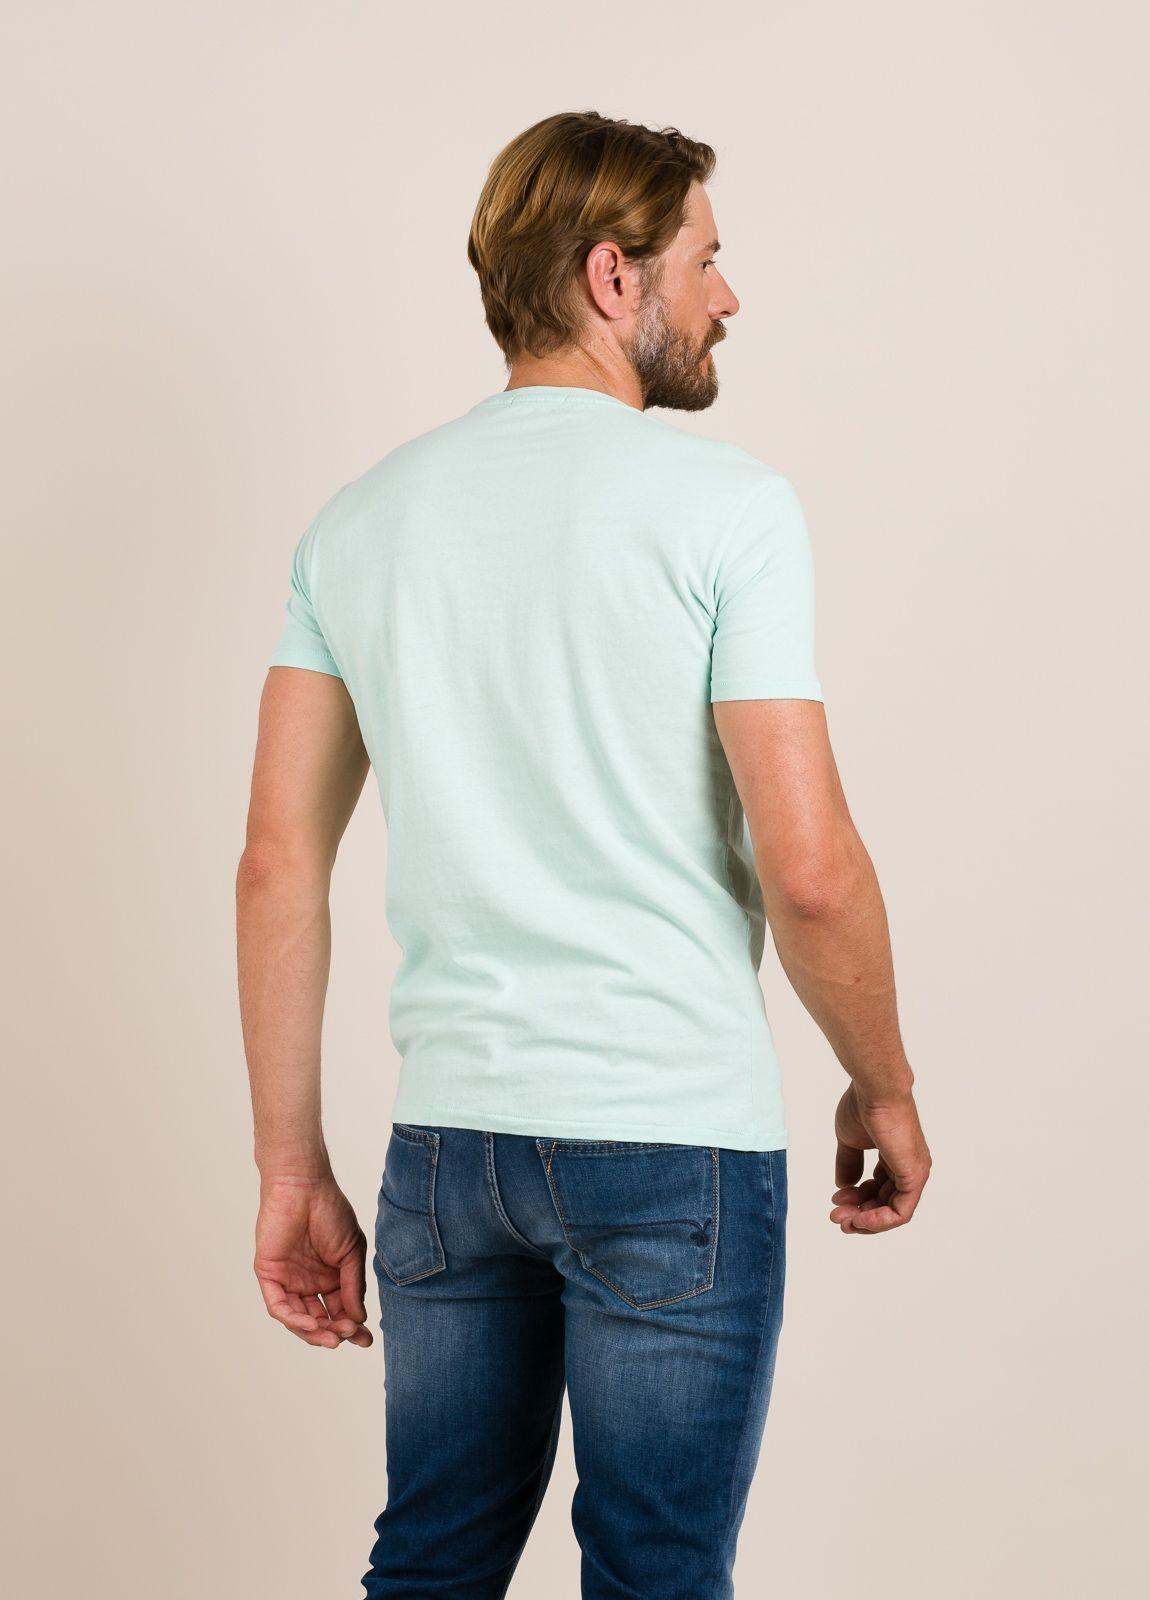 Camiseta REPLAY estampado gráfico verde - Ítem1